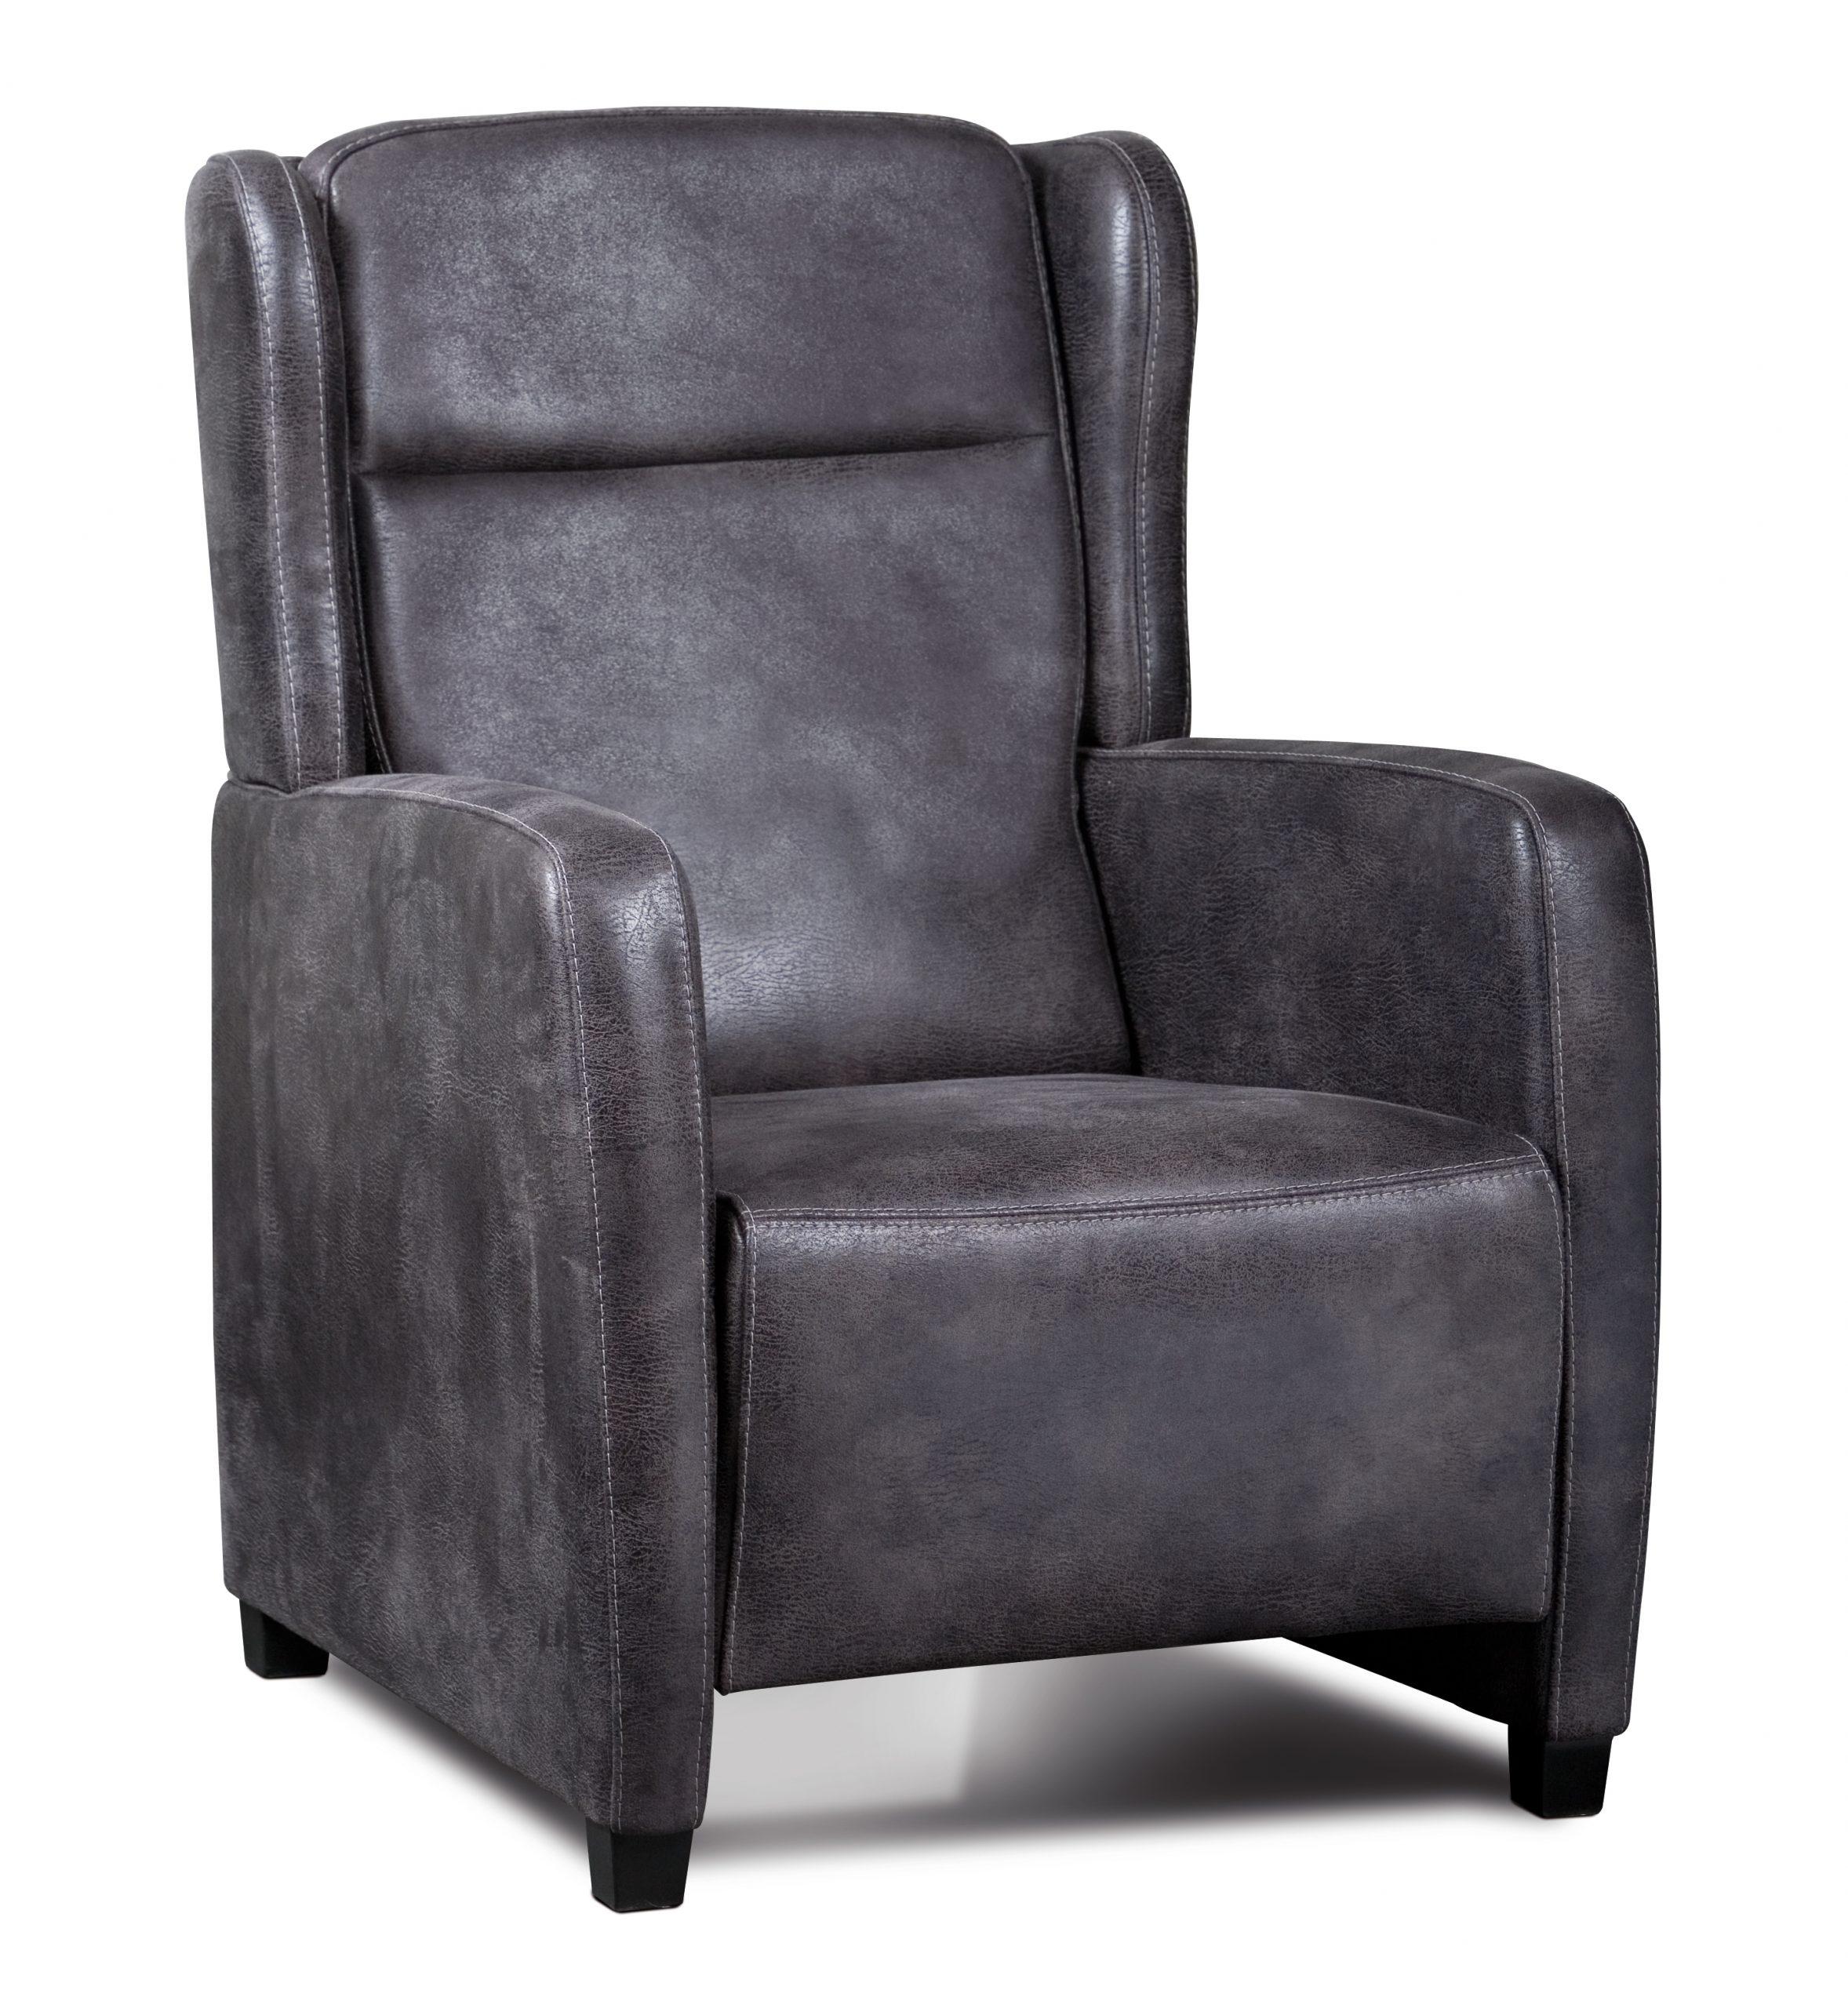 fauteuil Bram